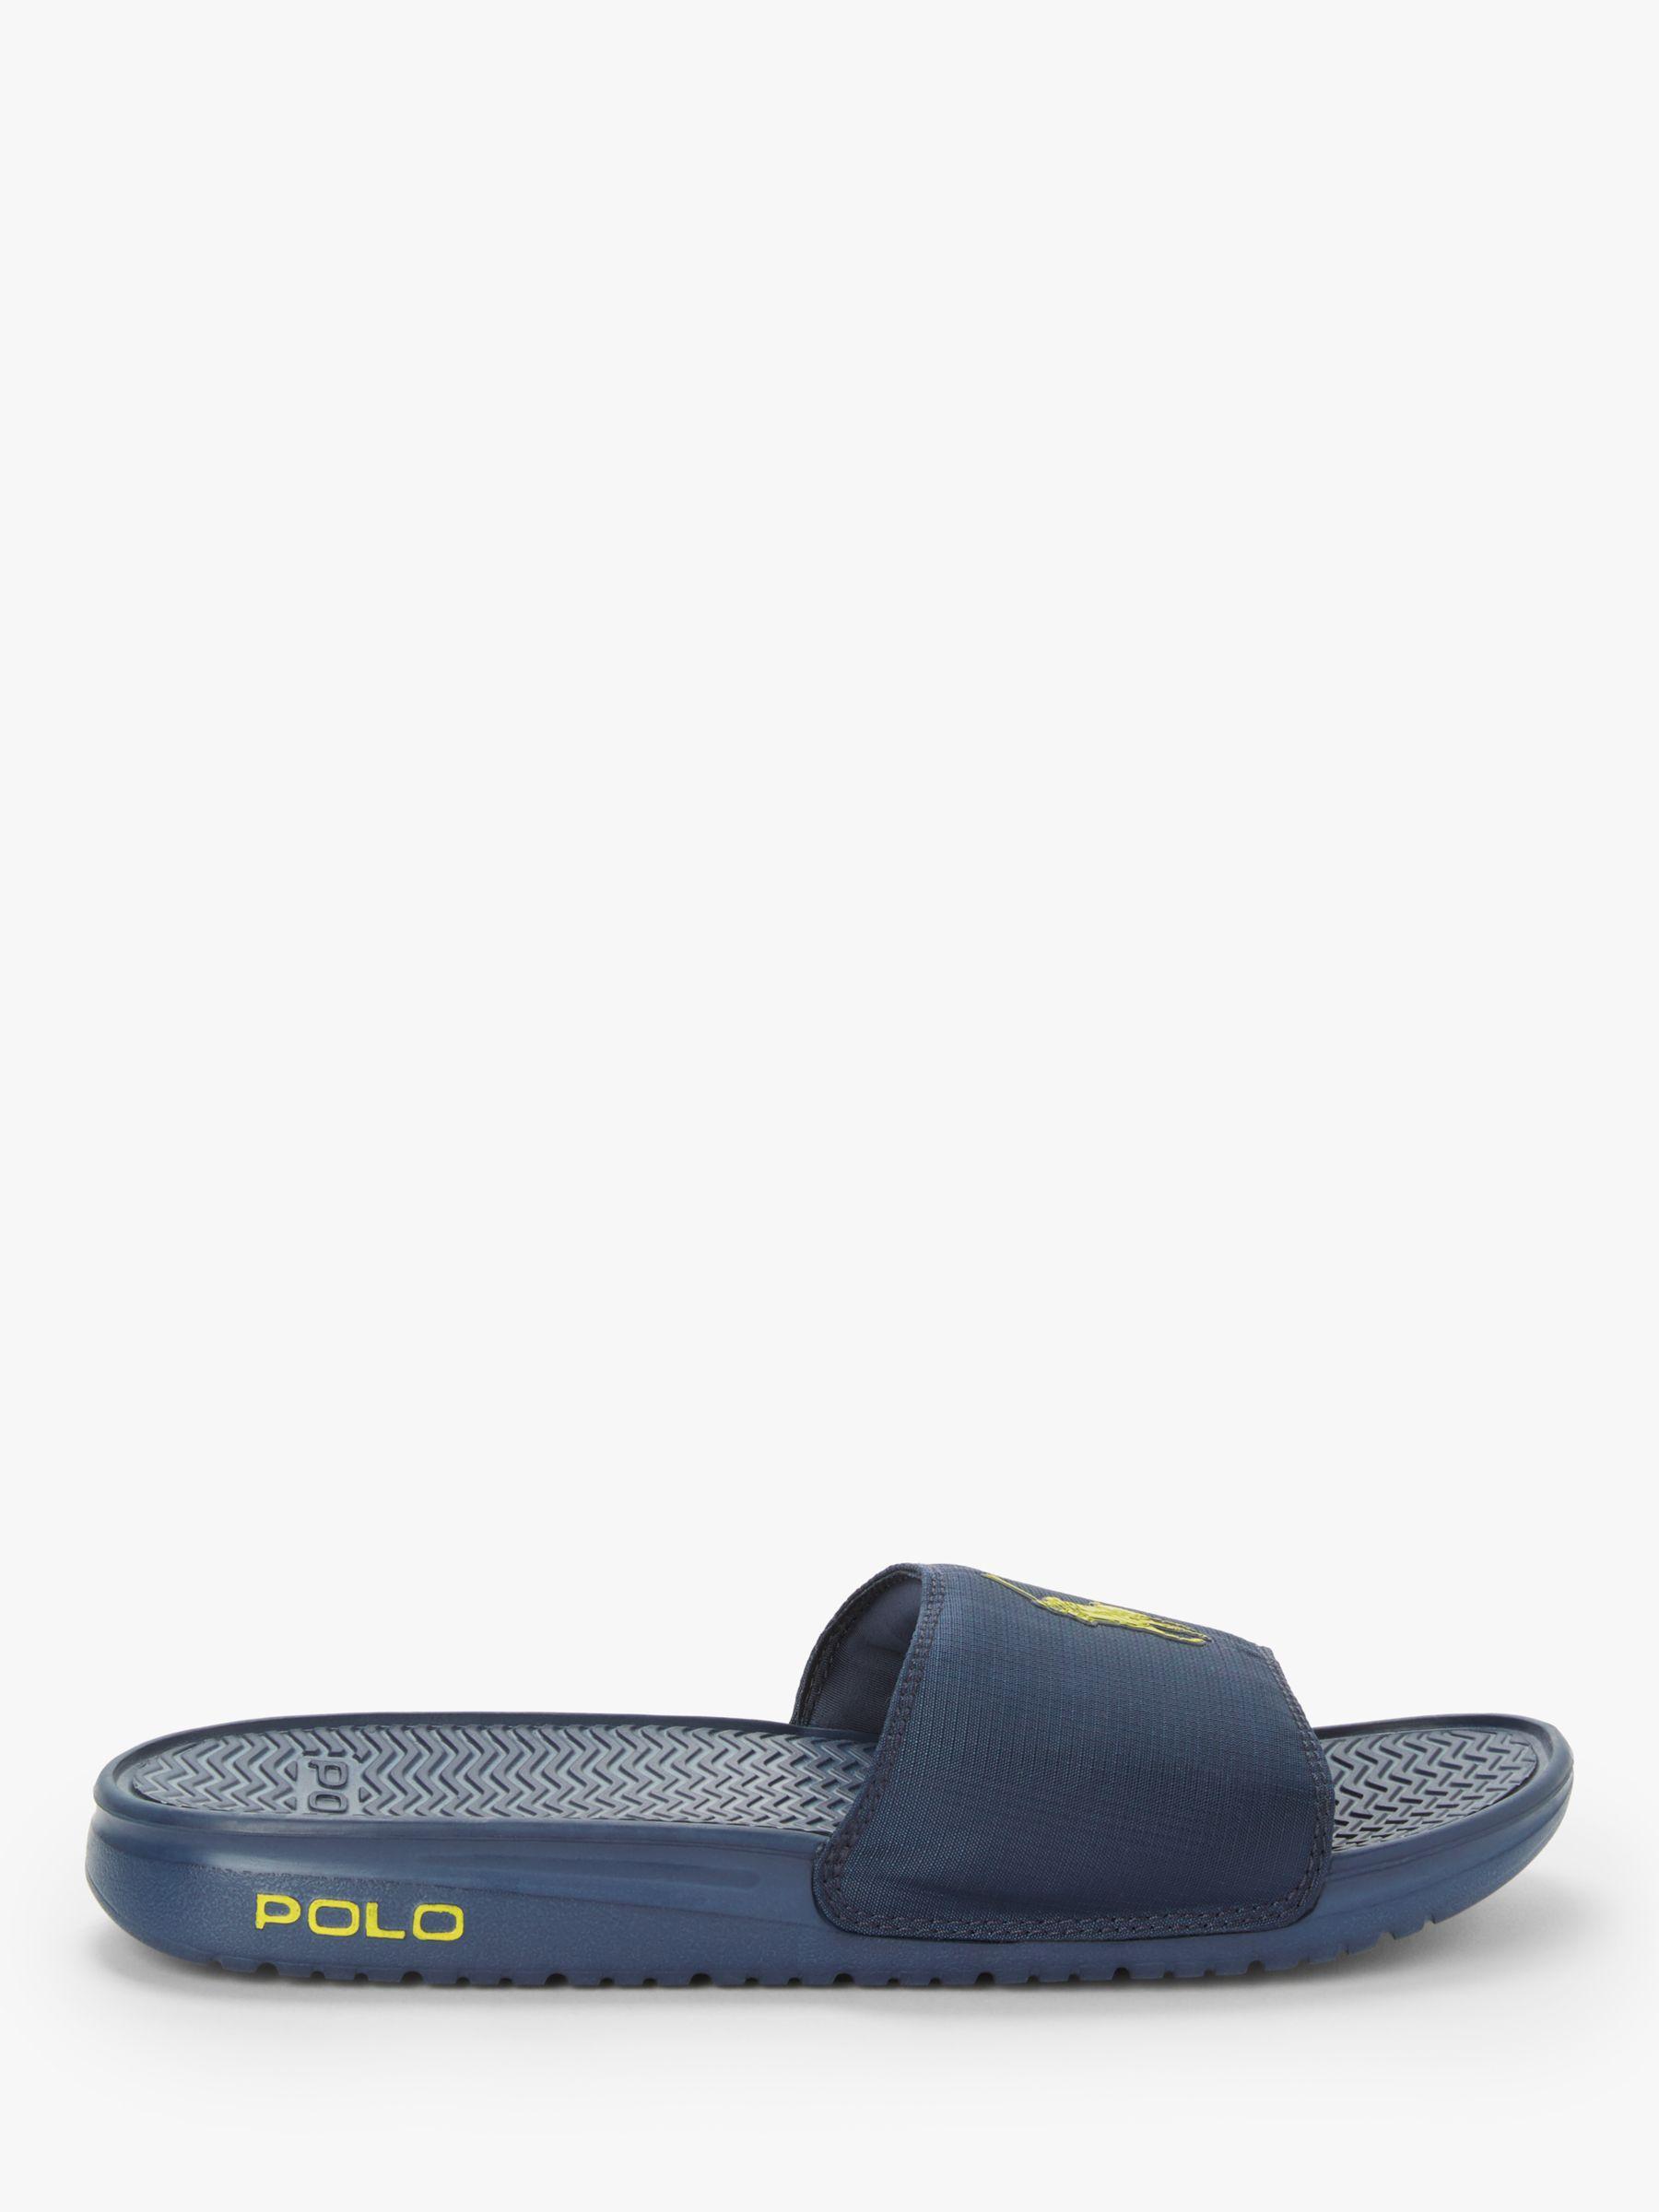 e33bc55a0e49 Ralph Lauren Polo Pool Sliders in Blue for Men - Lyst